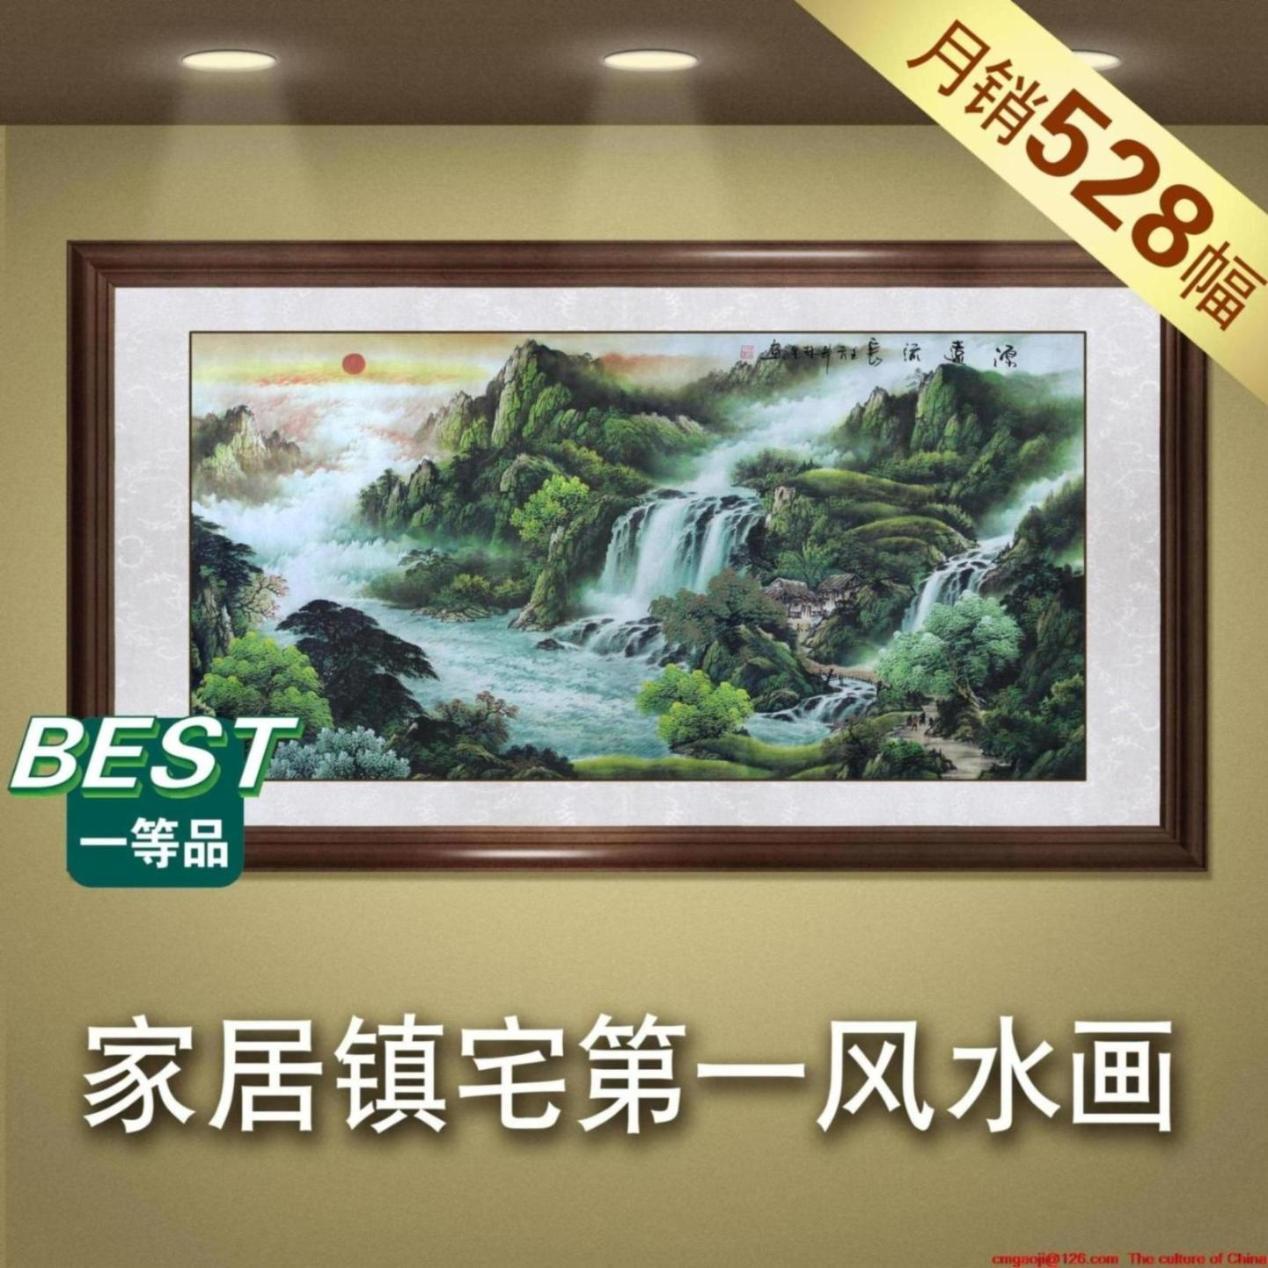 best paintings for bedroom feng shui feng shui paintings